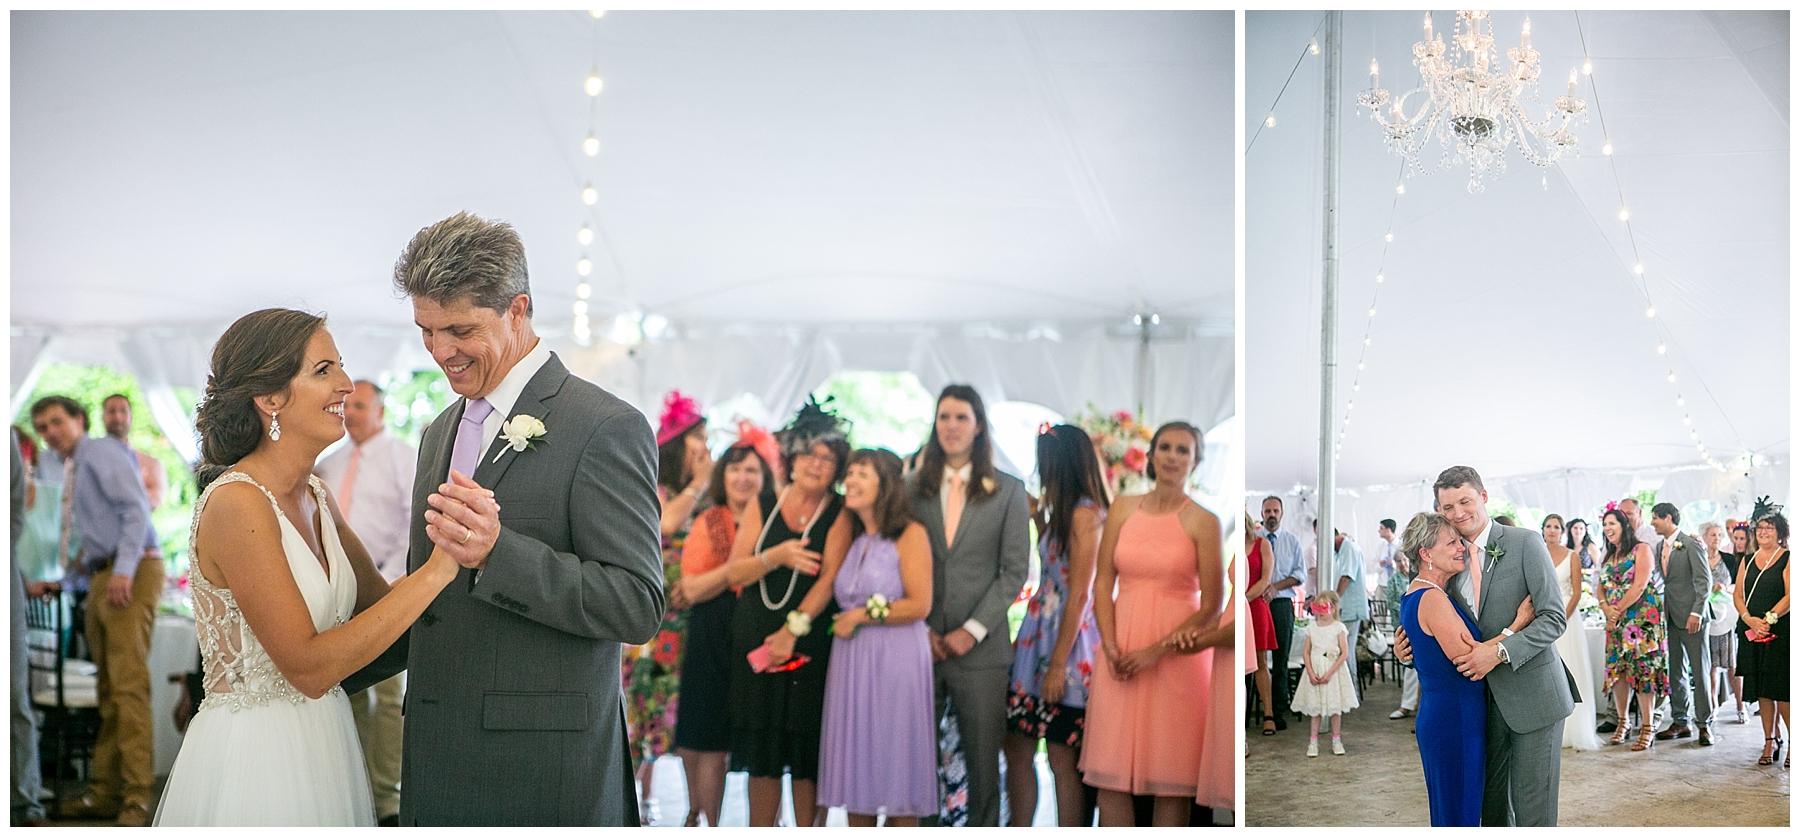 Chelsea Phil Bohemia River Overlook Wedding Living Radiant Photography photos_0138.jpg